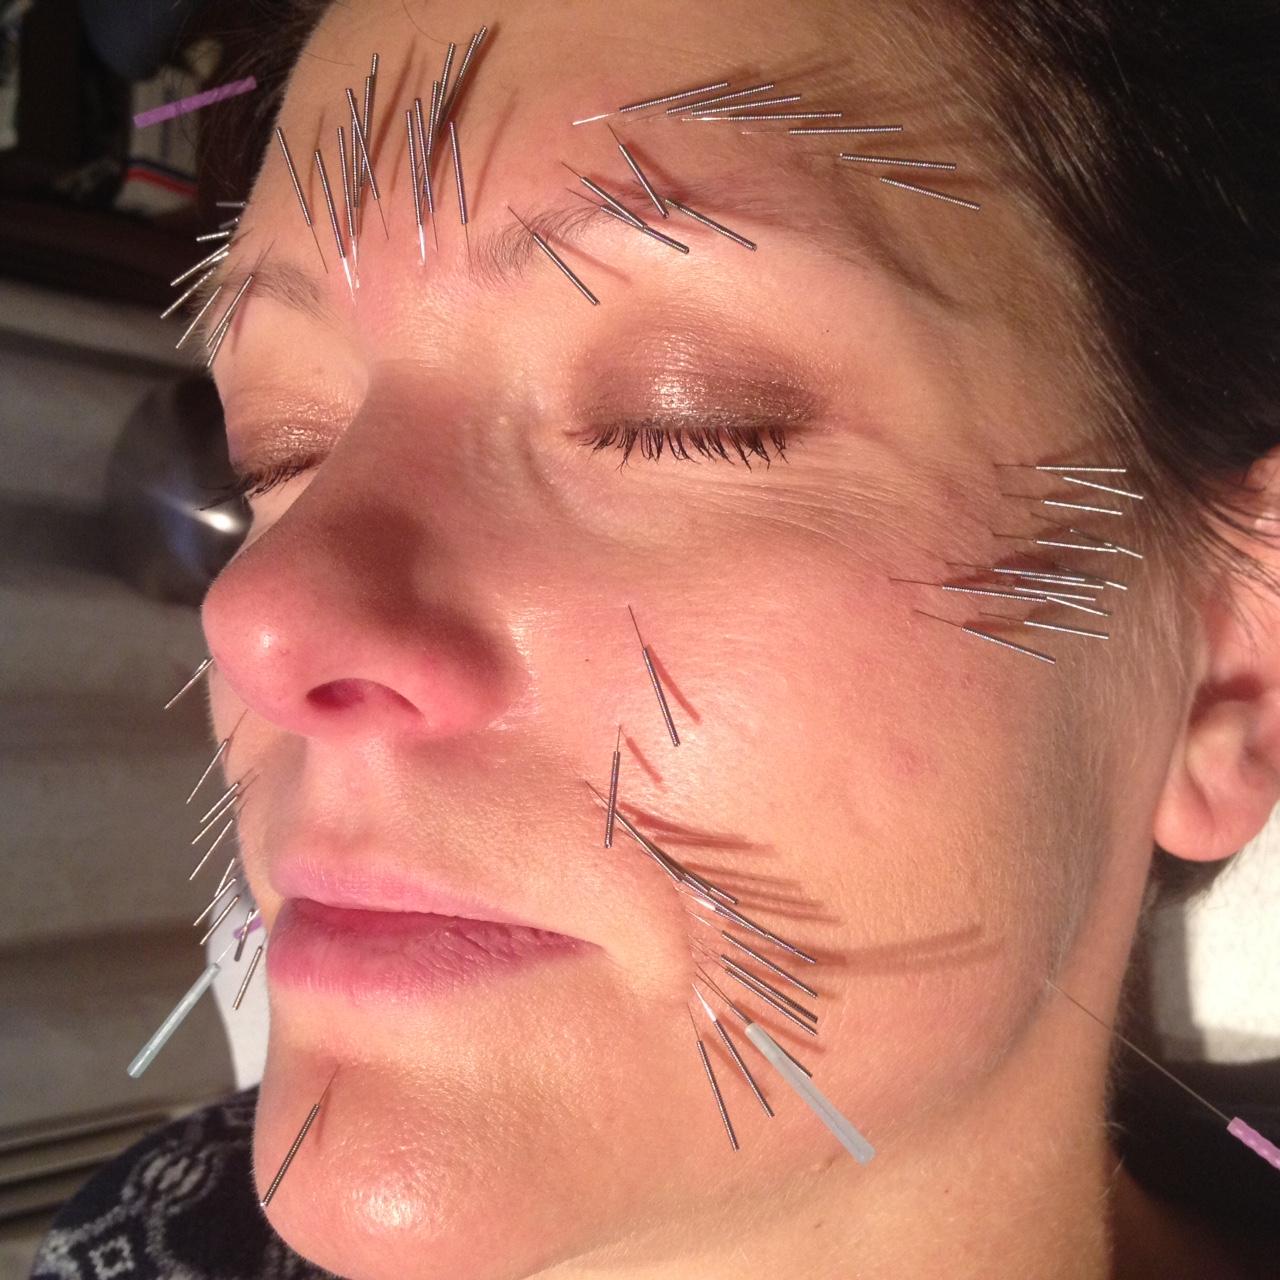 kosmetisk akupunktur före efter